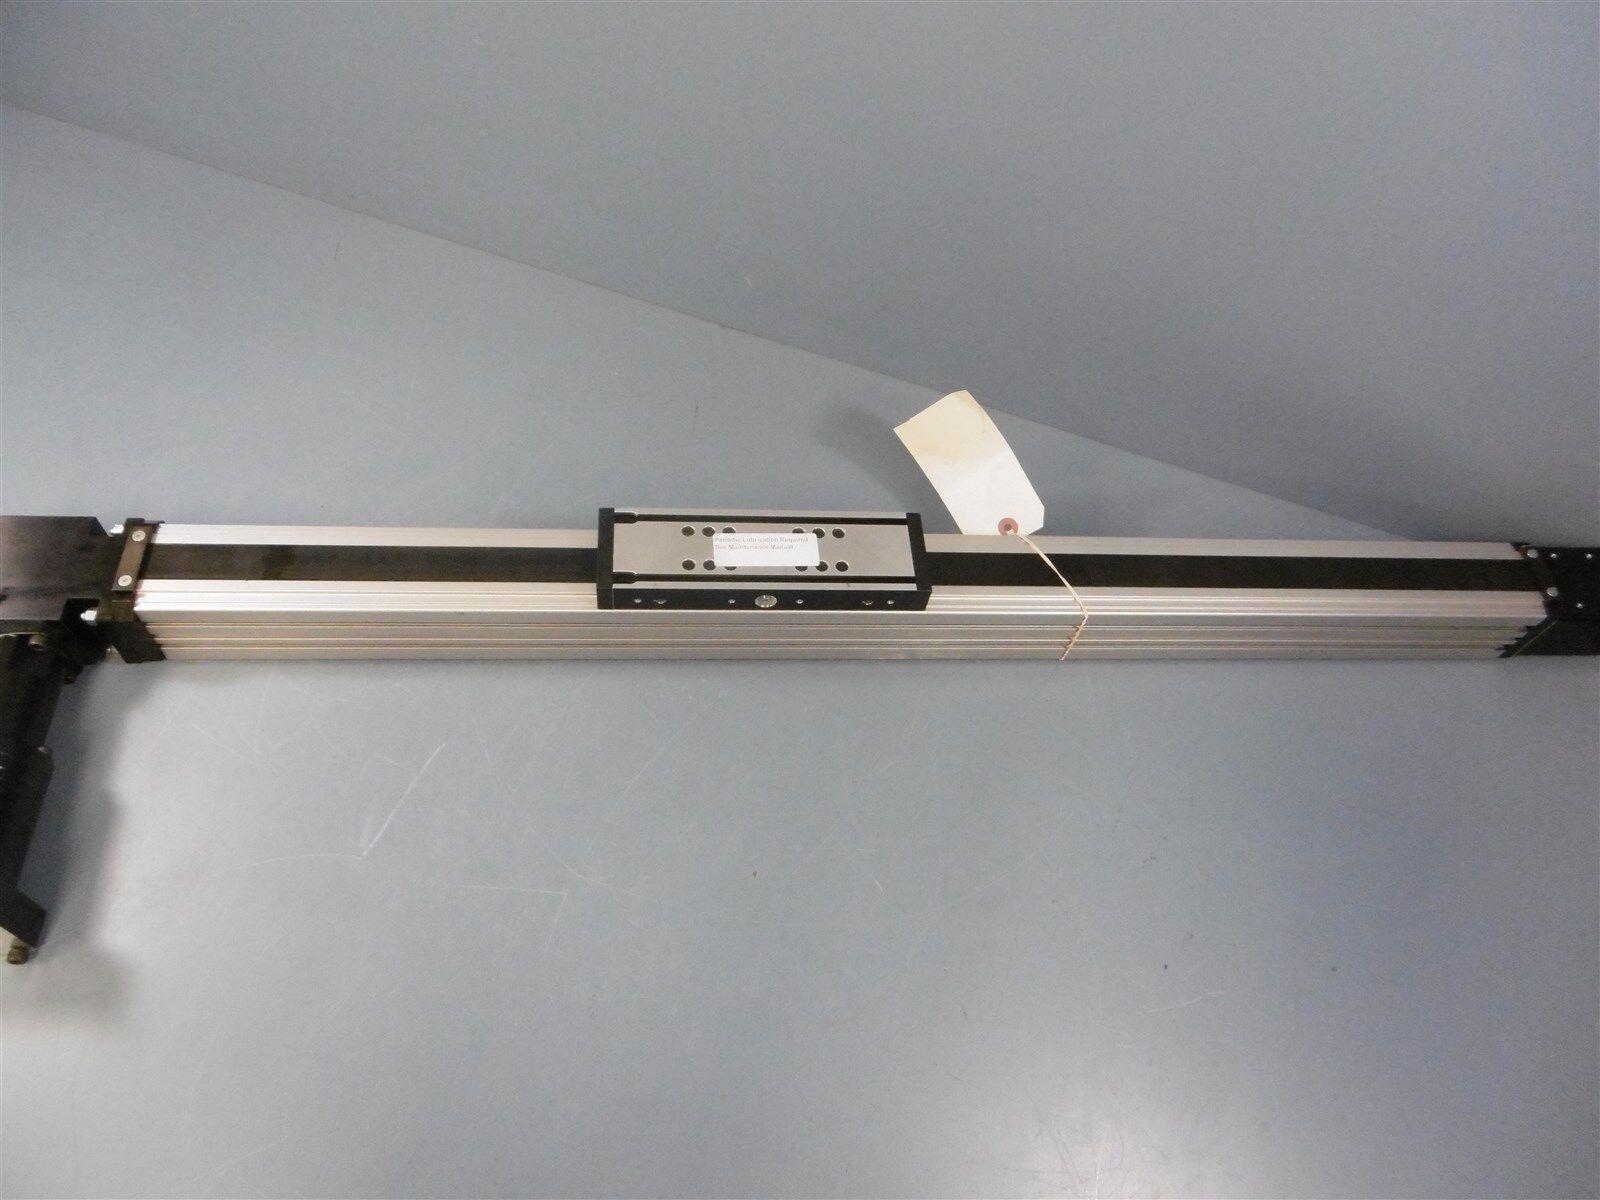 cb1170efbd9d Rexroth R114006000 Linear Slide Actuator Alpha LP 070-m01-5 Servo ...